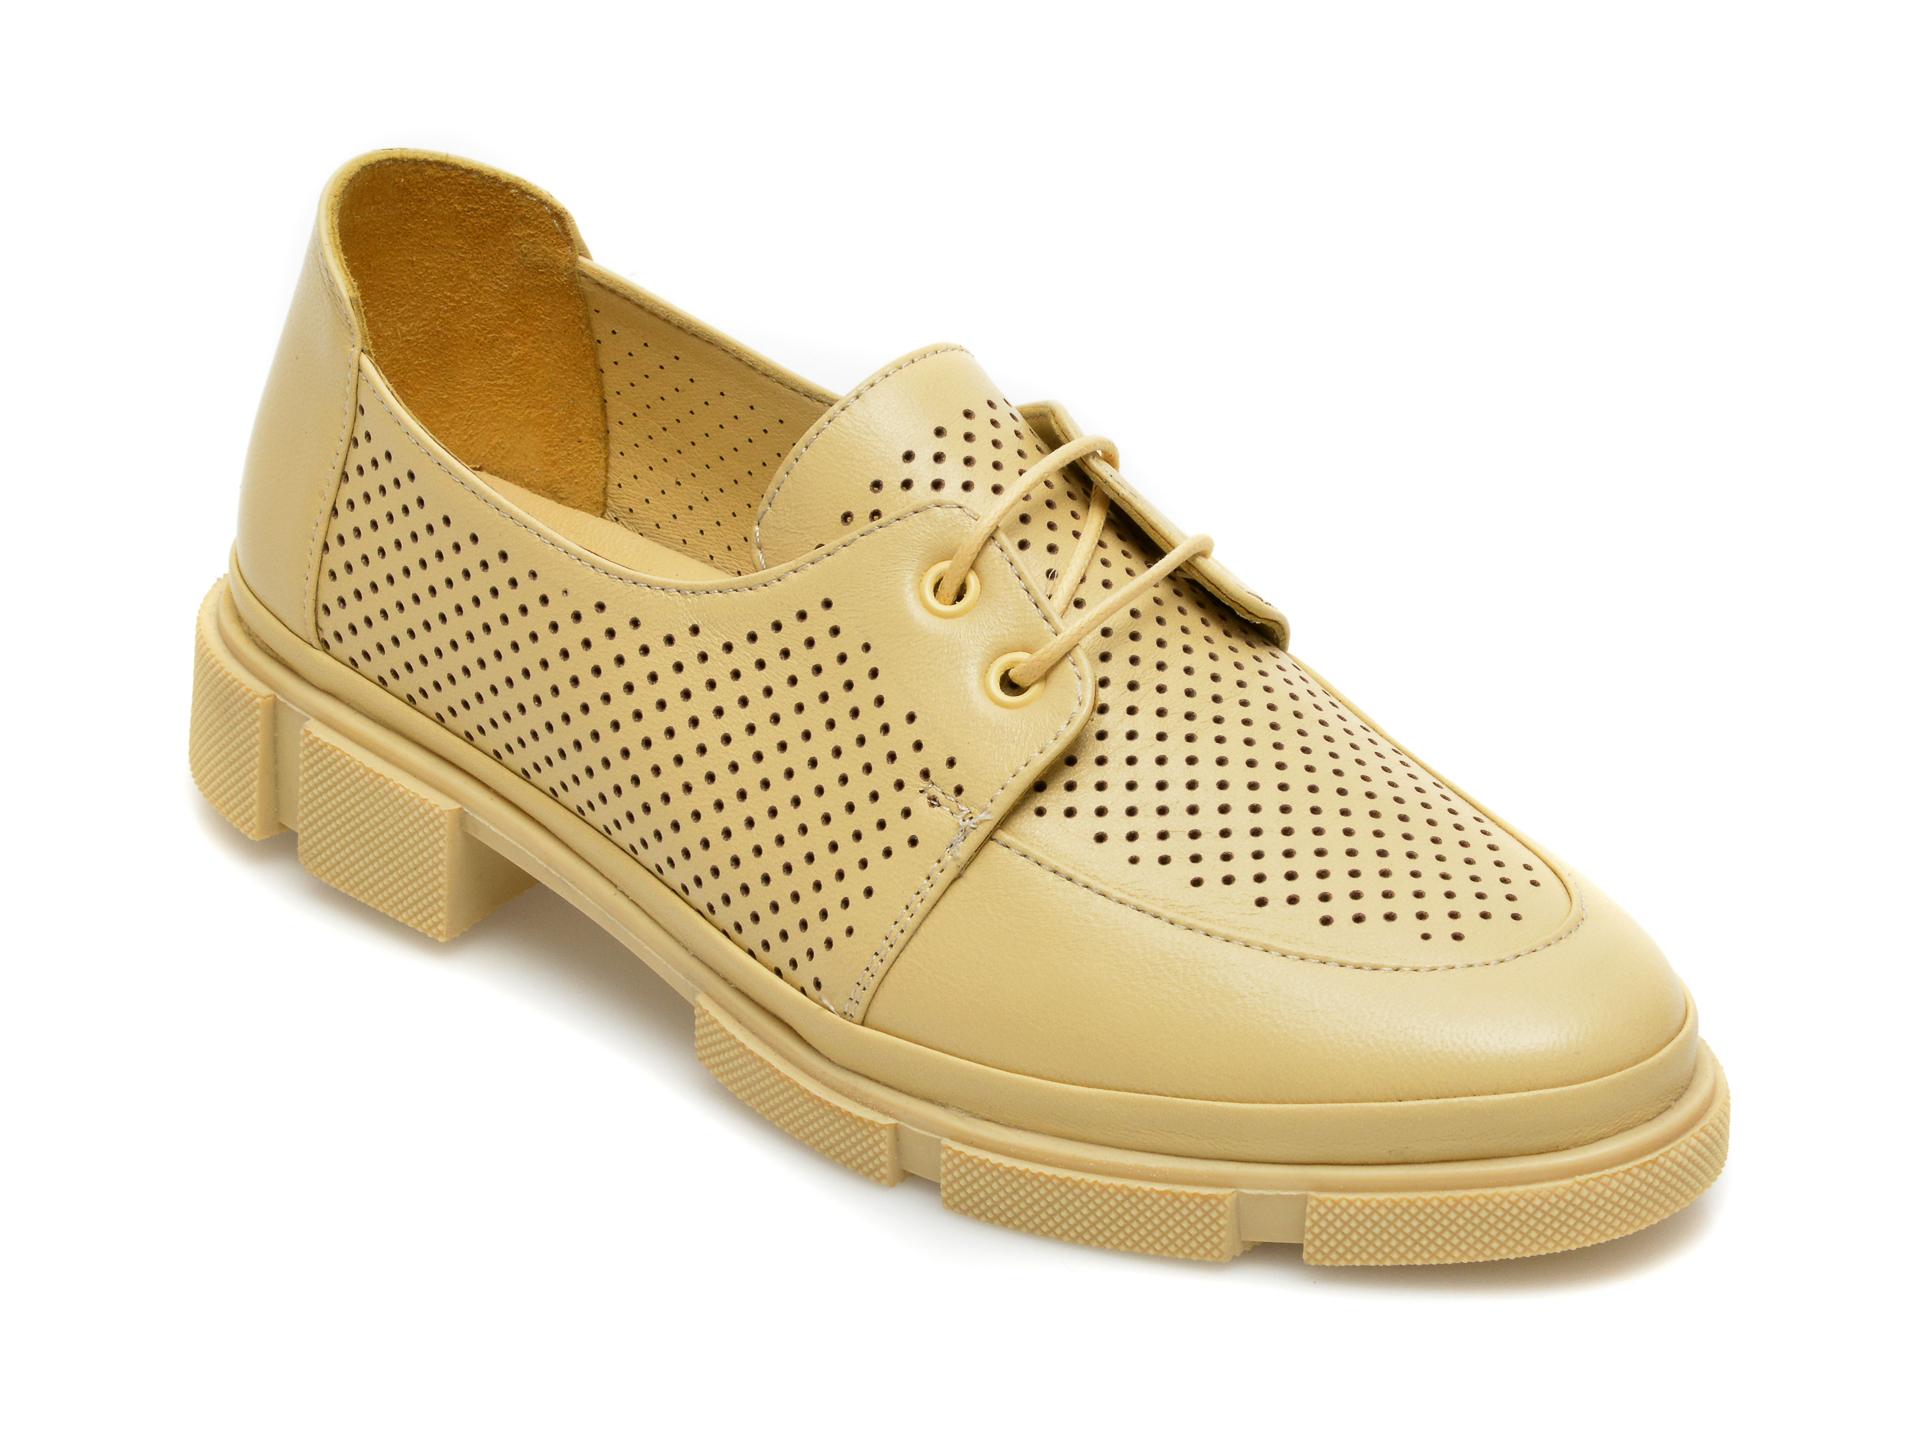 Pantofi MOLLY BESSA galbeni, MN107, din piele naturala